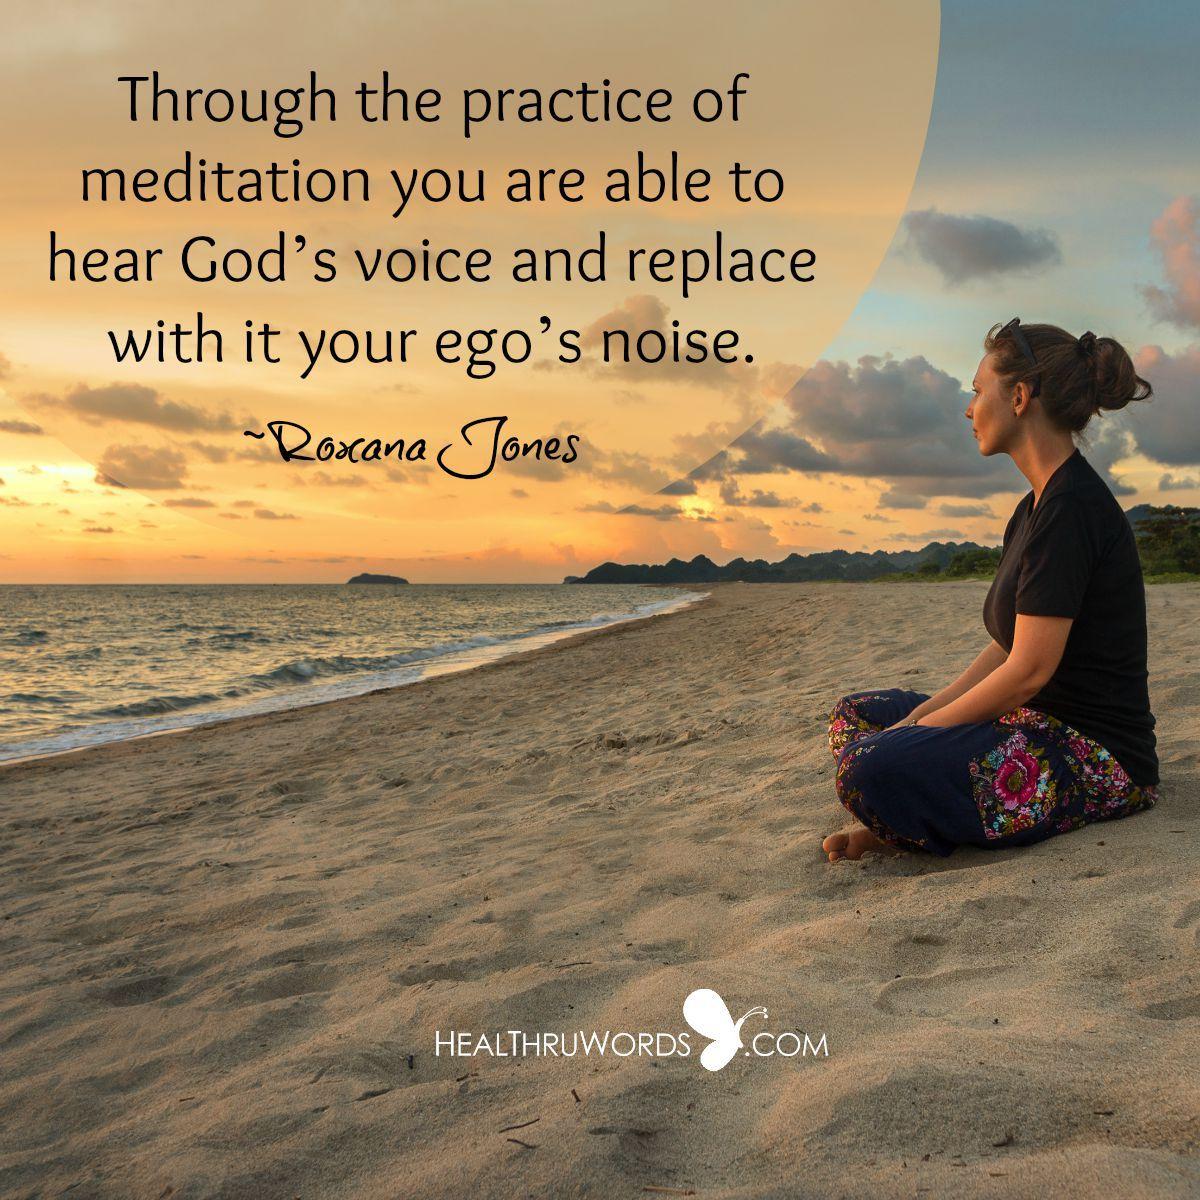 """Divine Meditation"" Through the practice of meditation you ..."